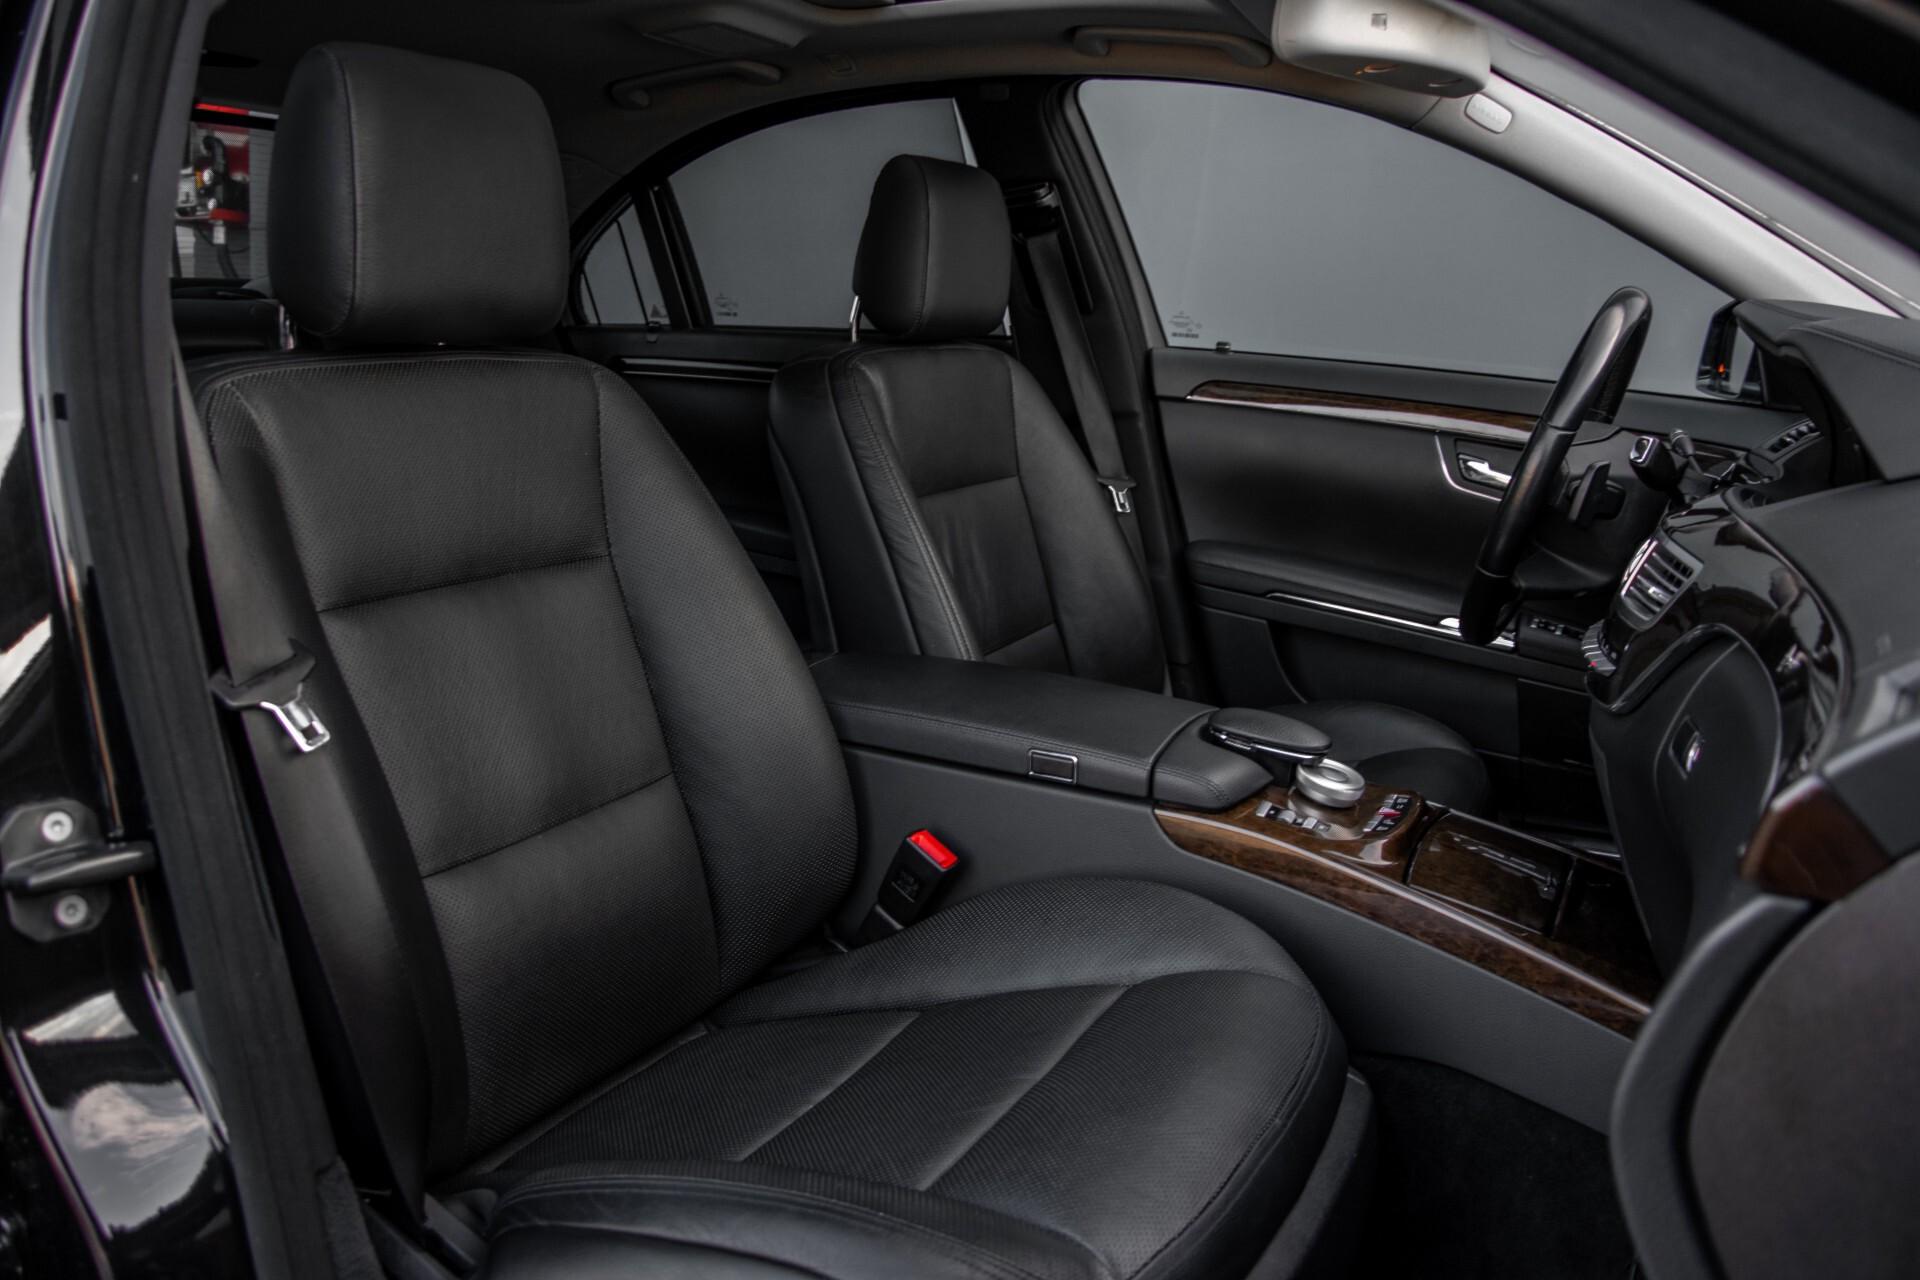 Mercedes-Benz S-Klasse 350 Bluetec Keyless/Distronic/Nightvision/Schuifdak/Harman-Kardon Aut7 Foto 4